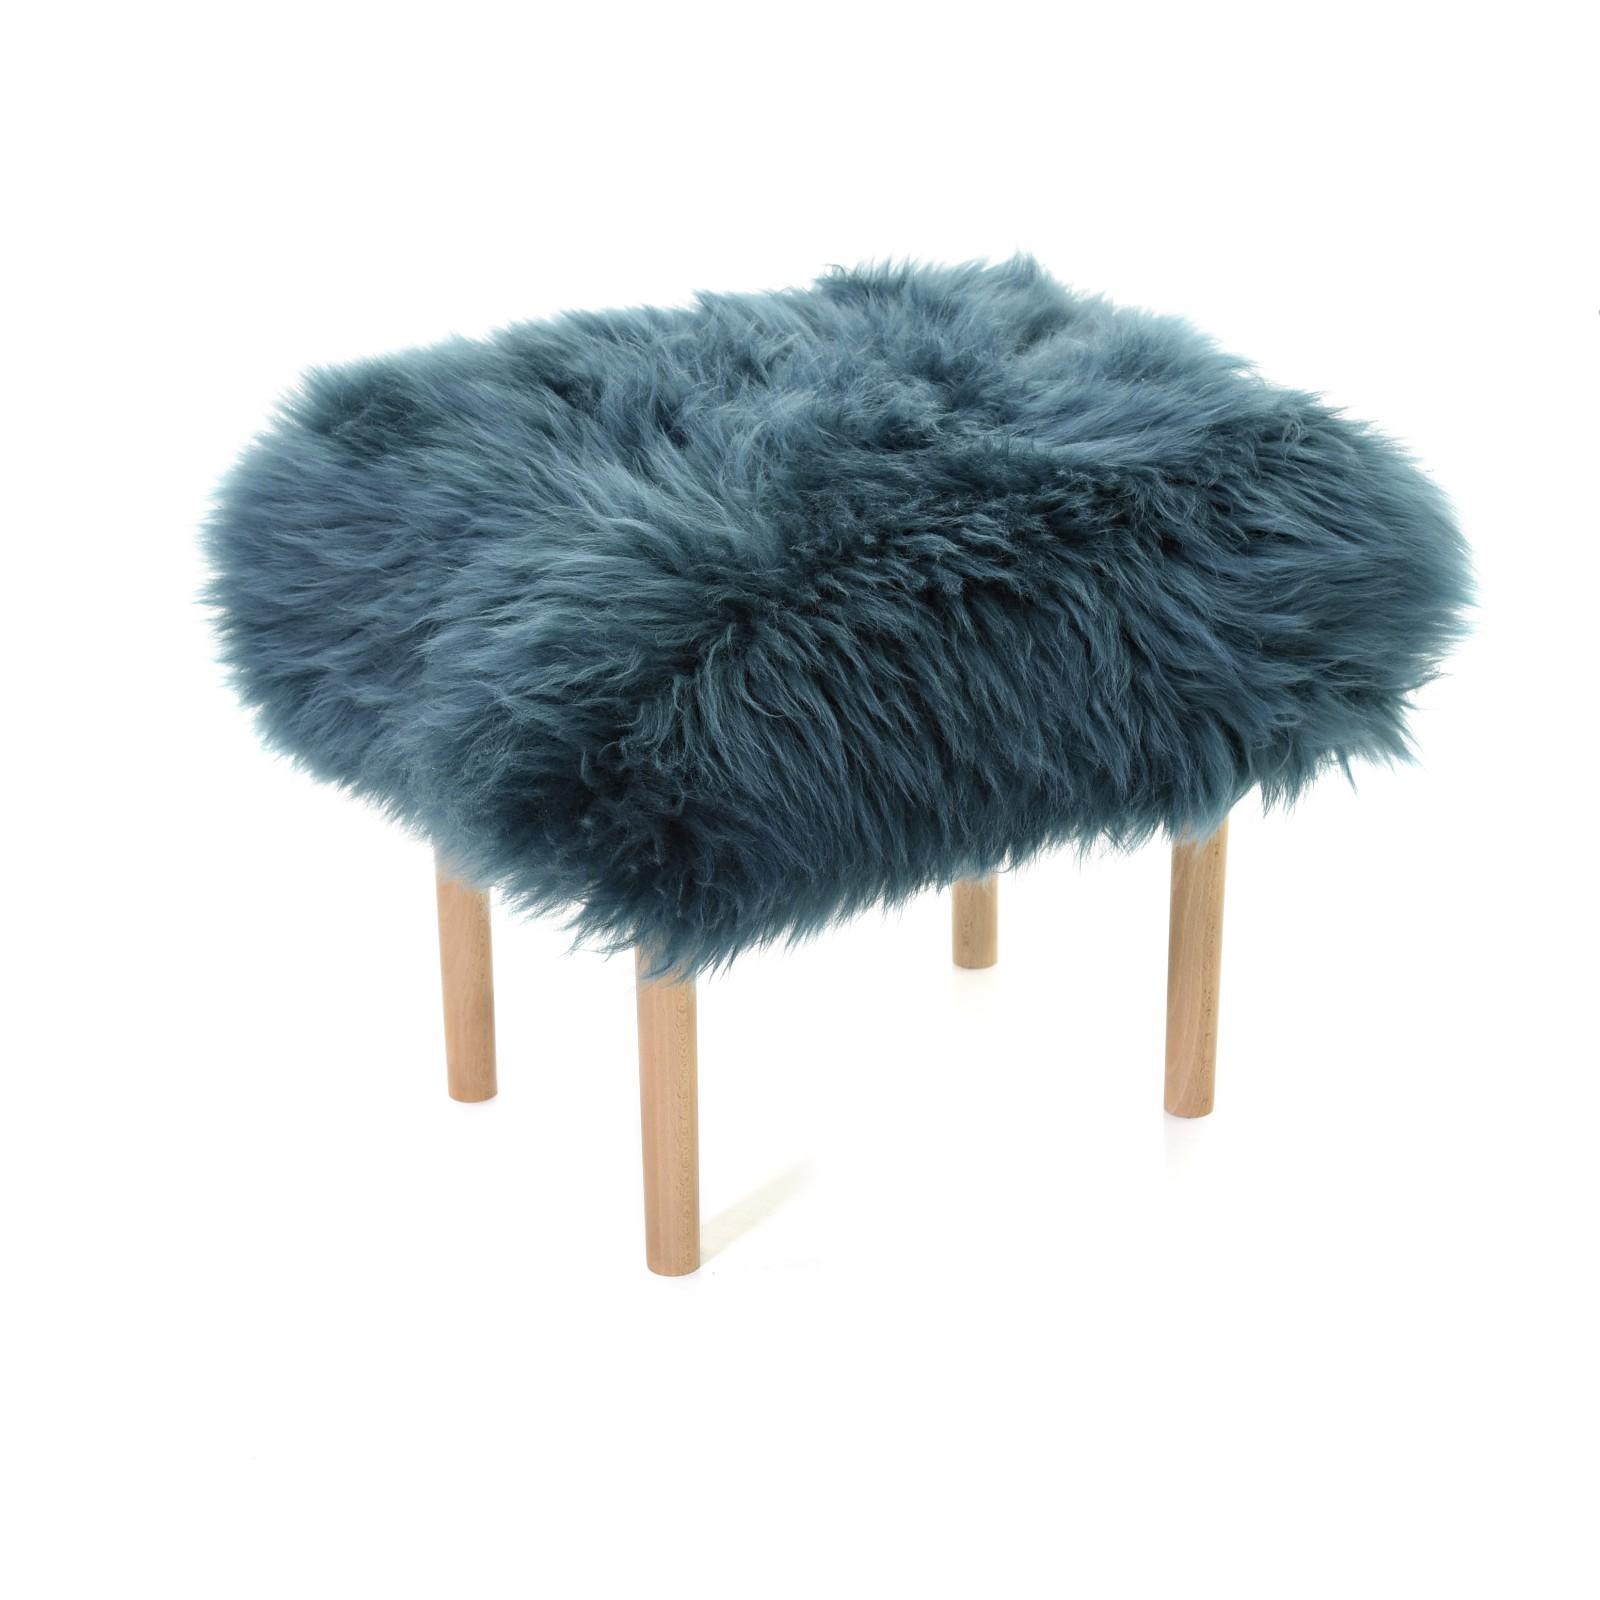 Carys - Sheepskin Footstool Teal